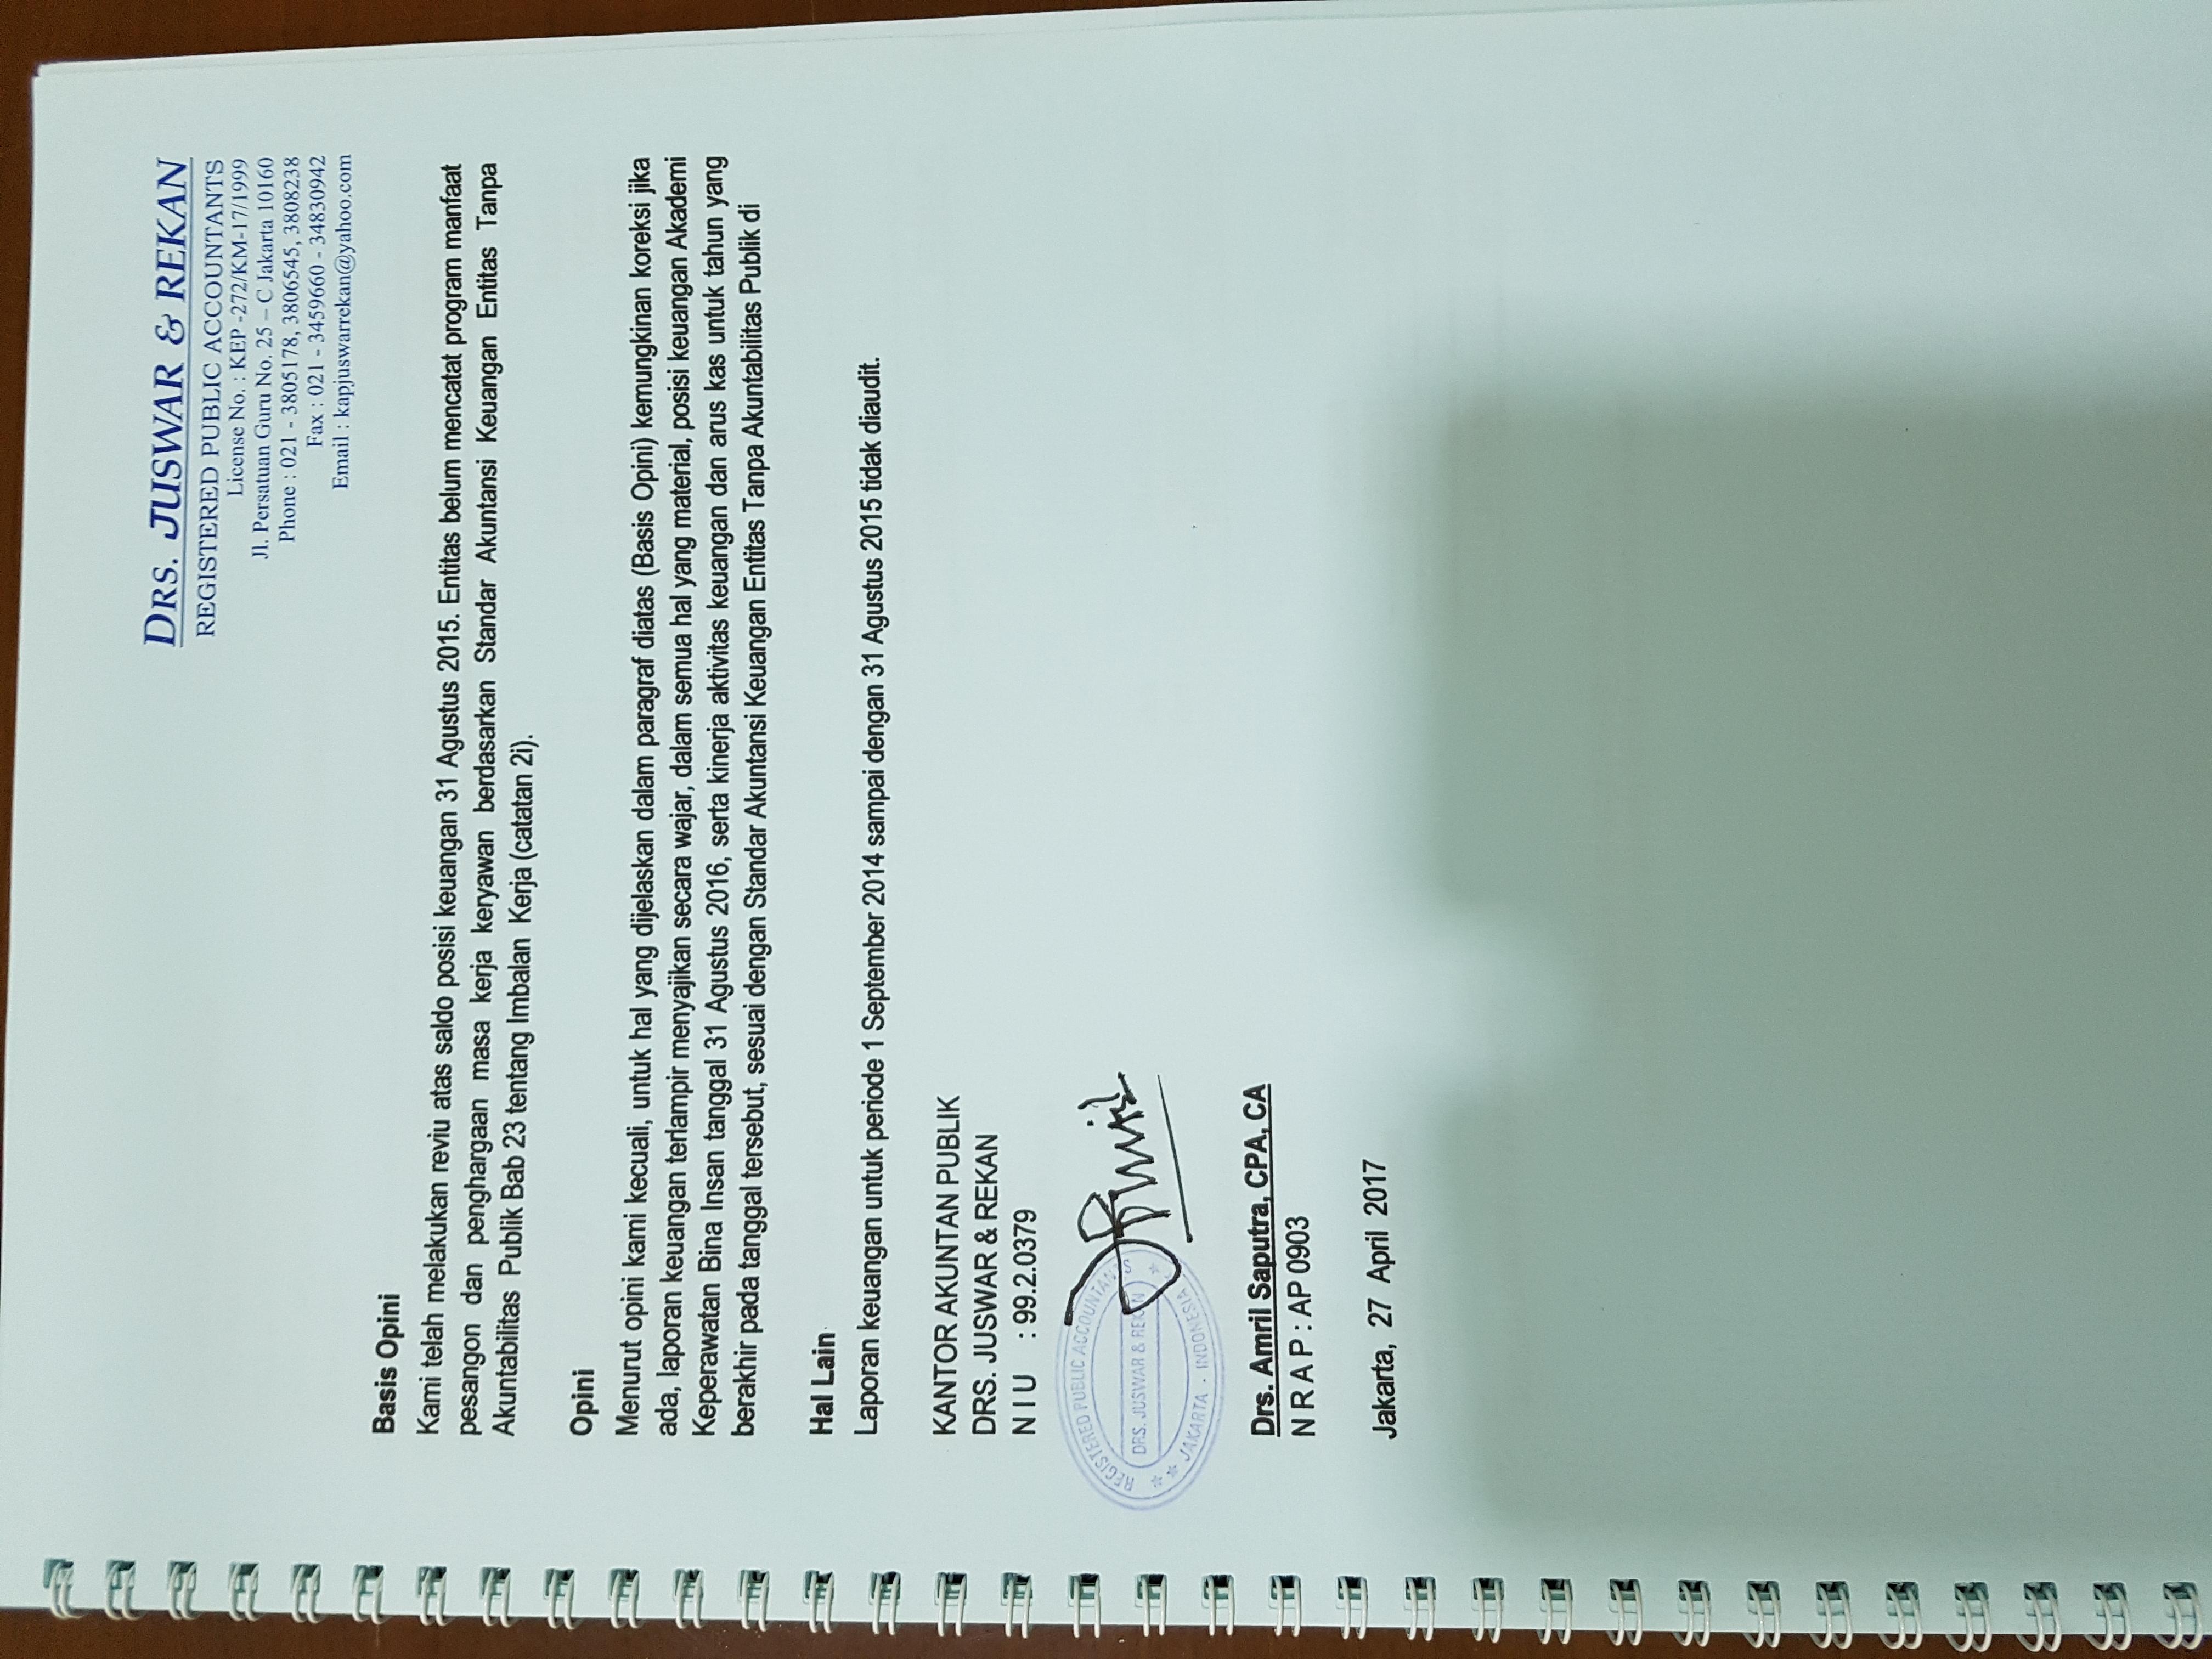 Laporan Audit Eksternal Akuntan Publik Independen Keuangan Akper Bina Insan 2017 Akper Bina Insan Akademi Keperawatan Bina Insan Jakarta